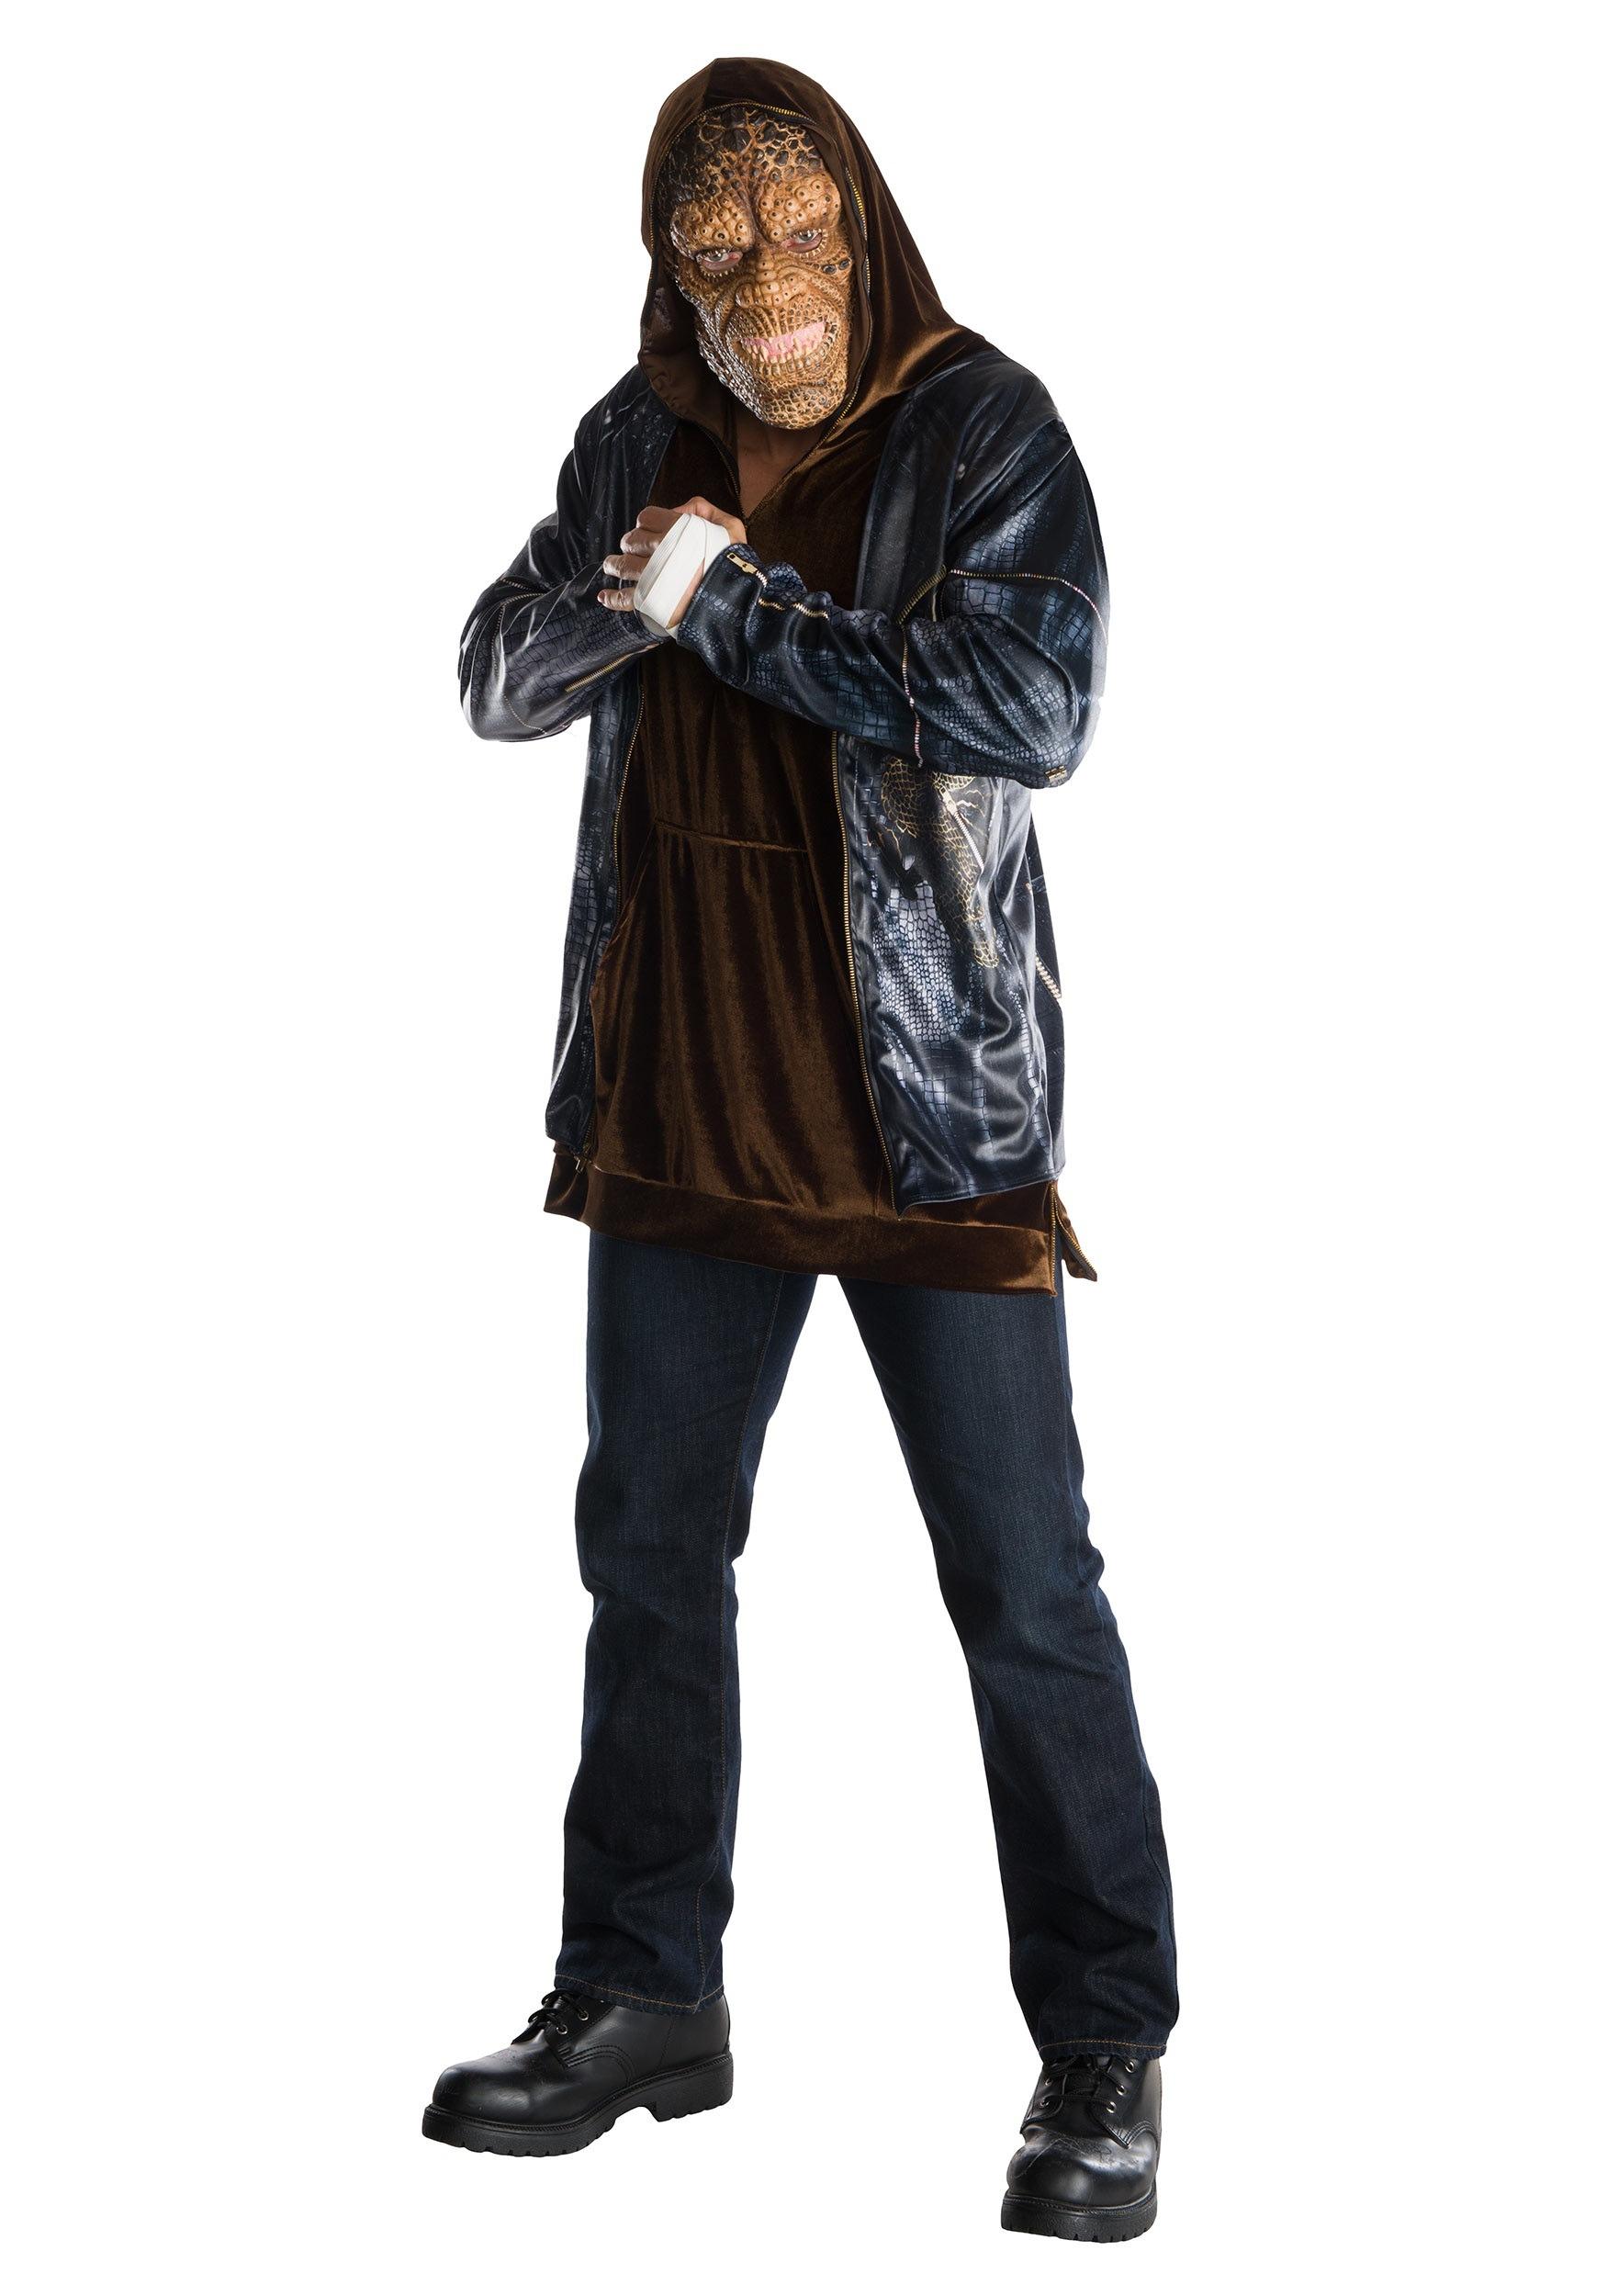 Deluxe Suicide Squad Killer Croc Costume RU820117